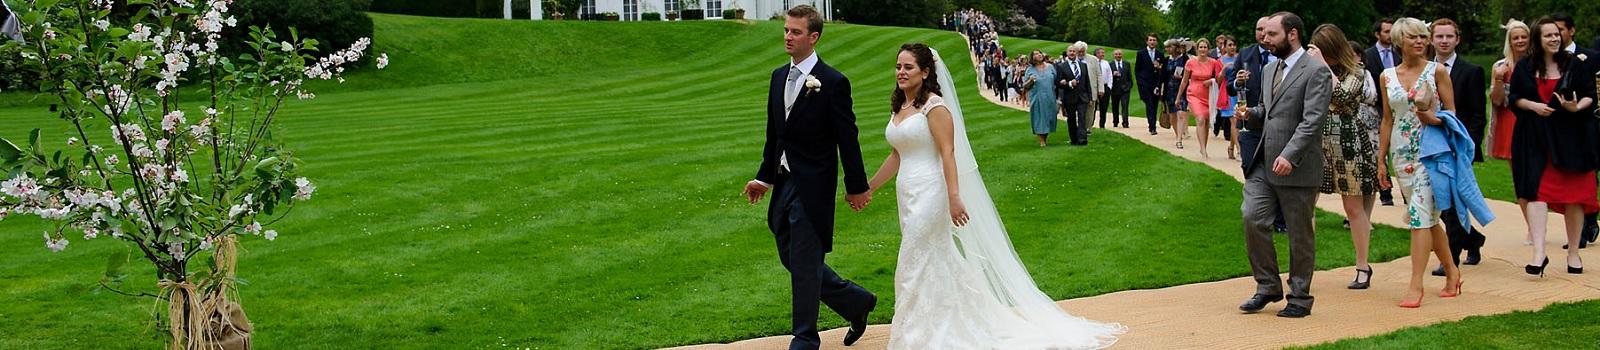 Houghton-Lodge-Wedding-Reception